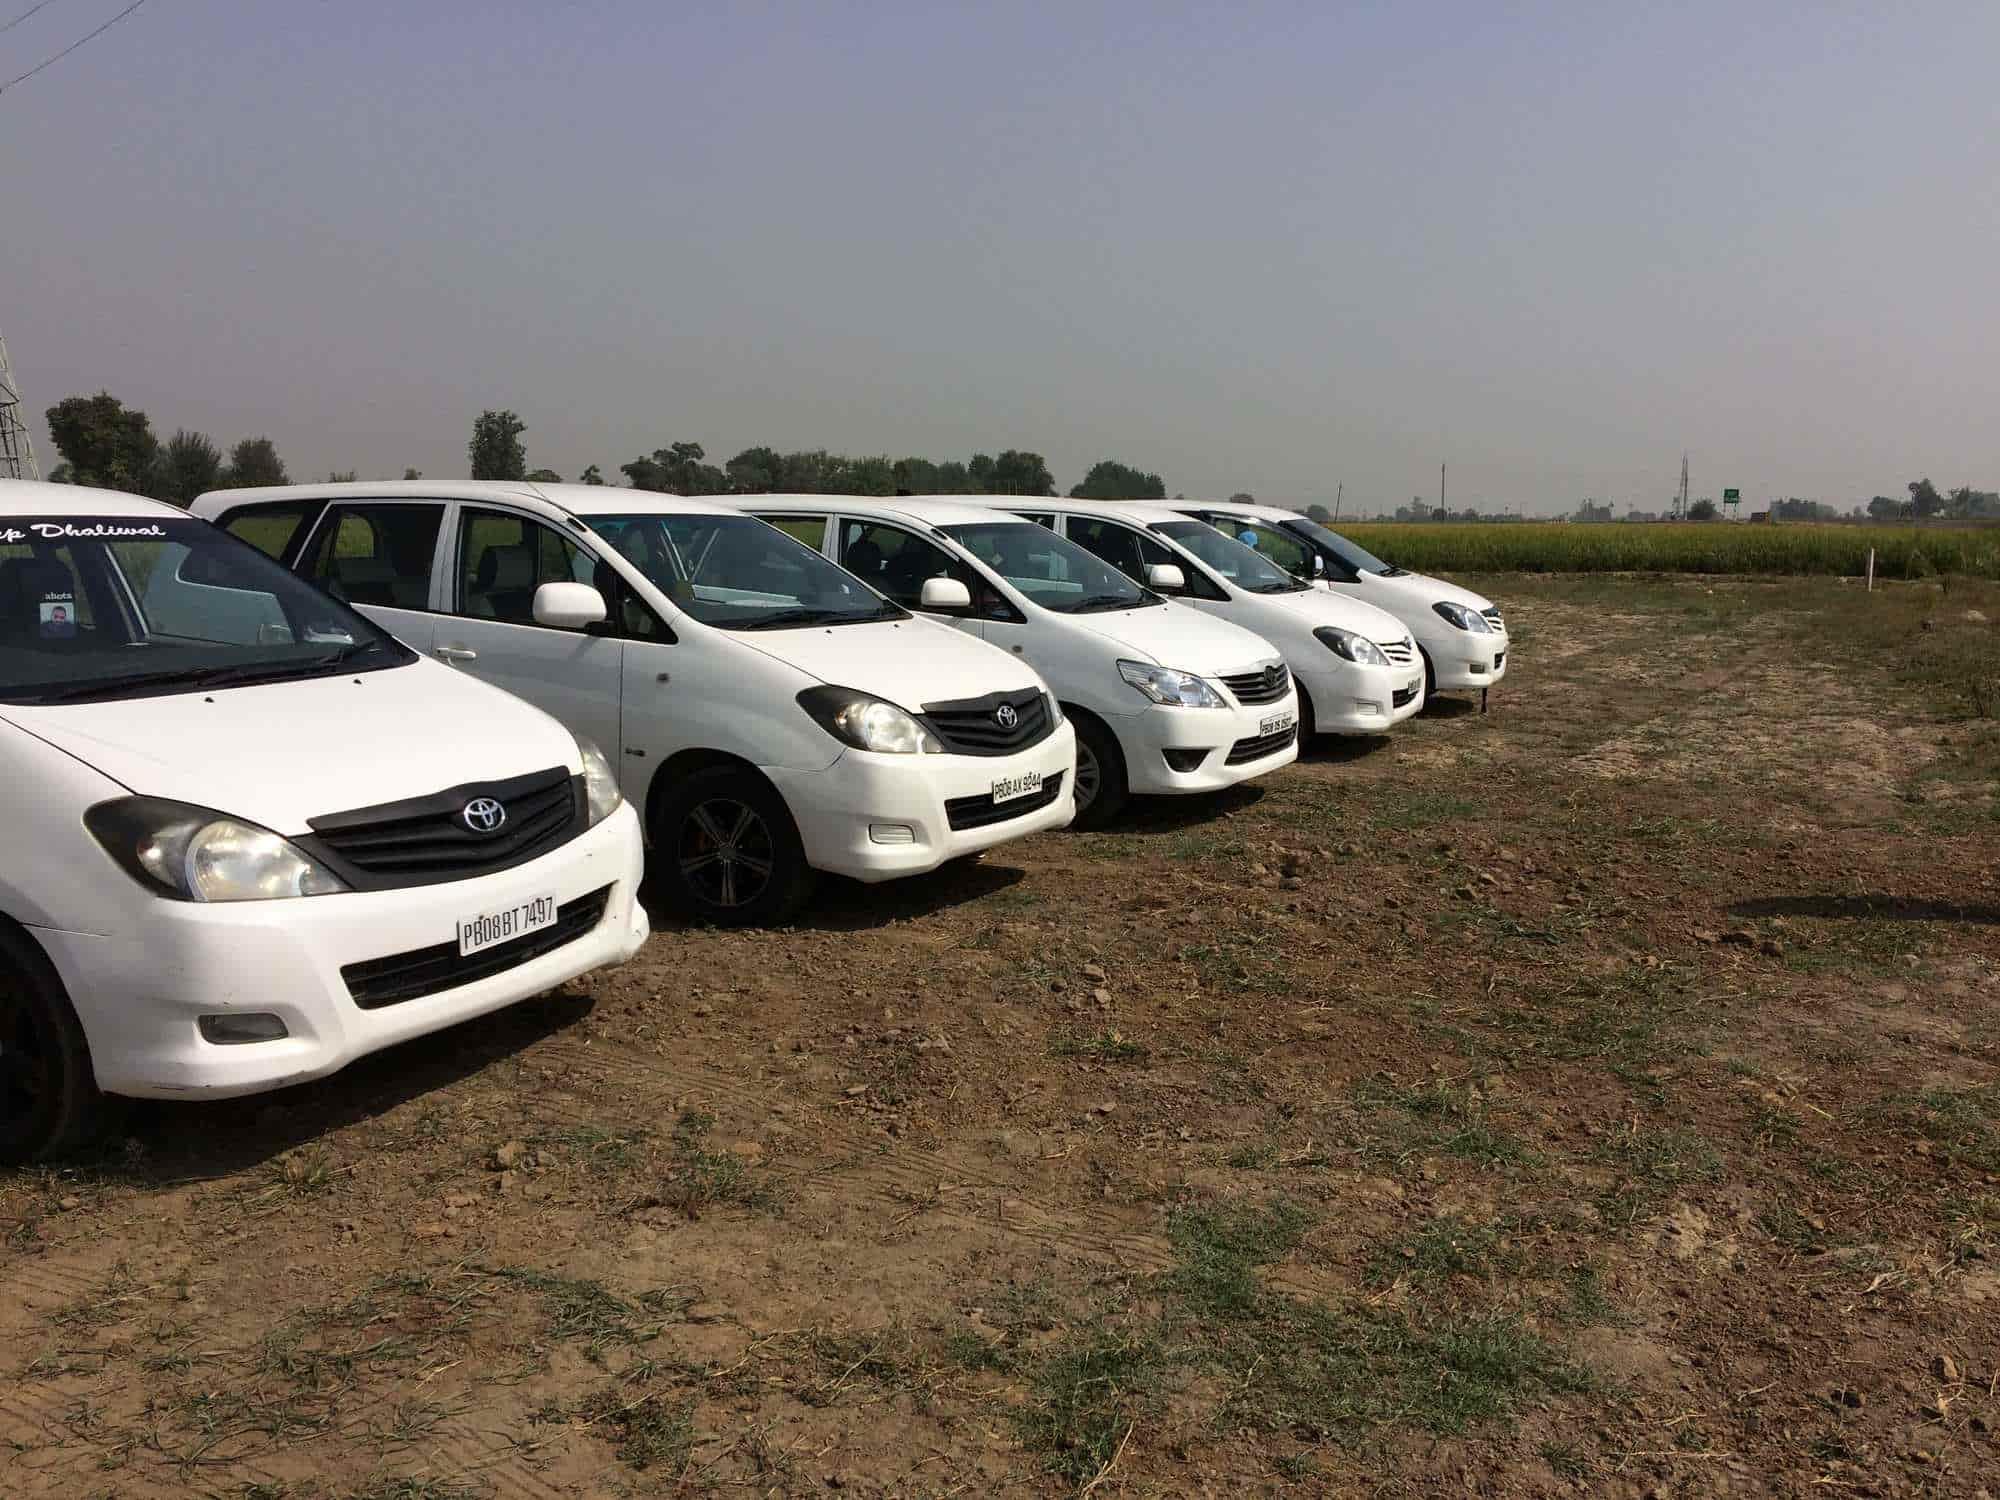 Sunny Tour & Travel Jalandhar City Car Hire in Jalandhar Justdial